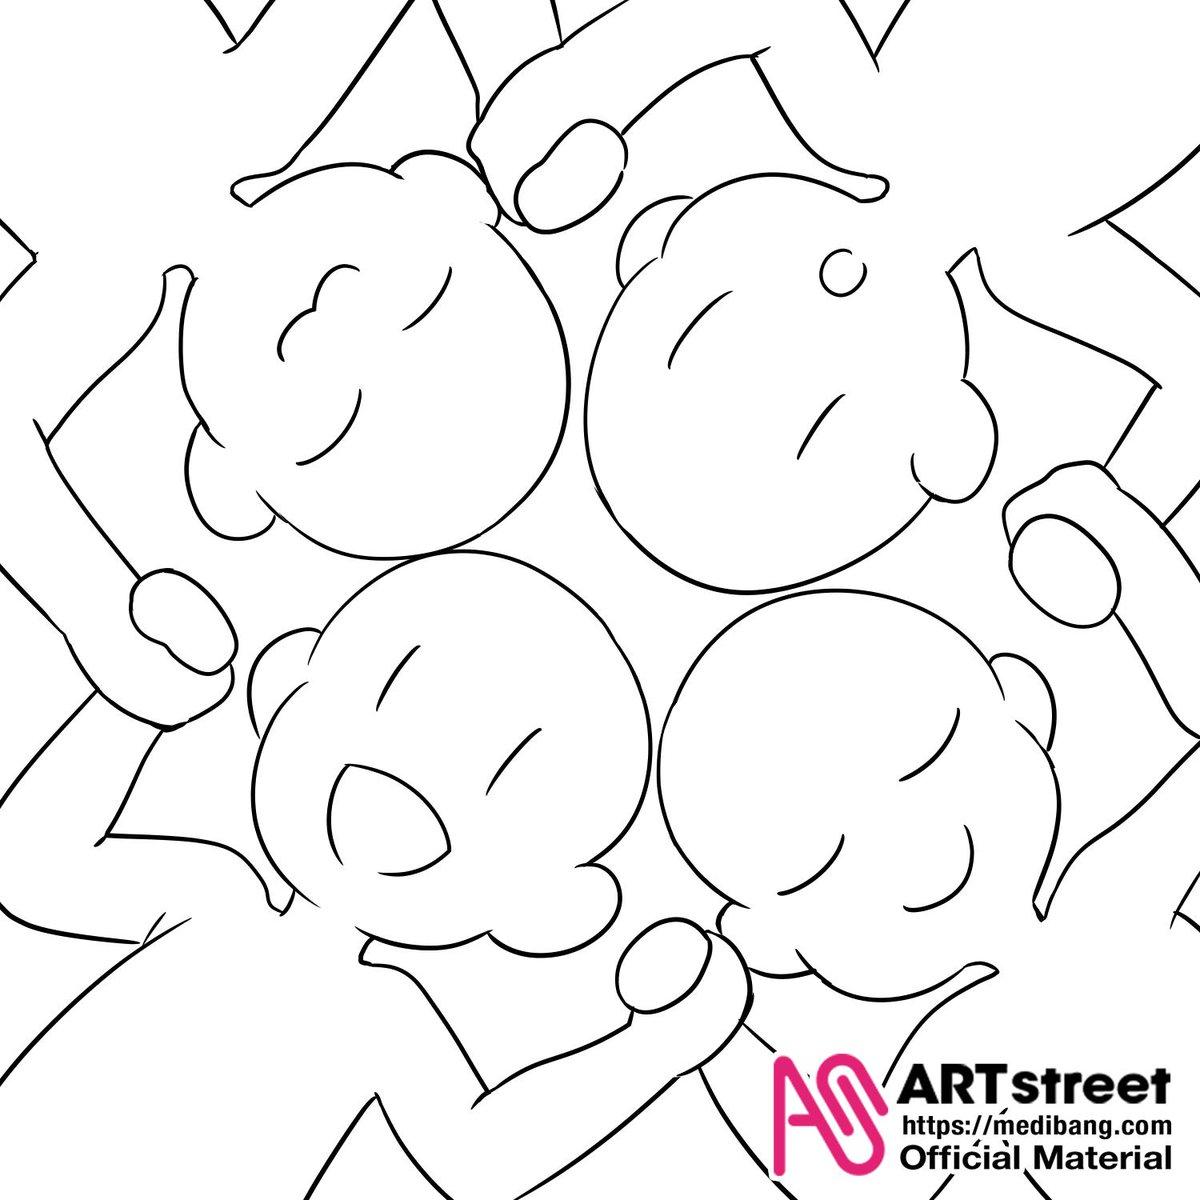 Art Street Official メディバン בטוויטר Art Street 新公式企画 投稿作品80作品超え 100作品目前なので燃料を追加いたします 今回は4人 5人用のベース素材ですッ 推しが4人組or5人組の方是非ご検討 ご利用ください アイドル